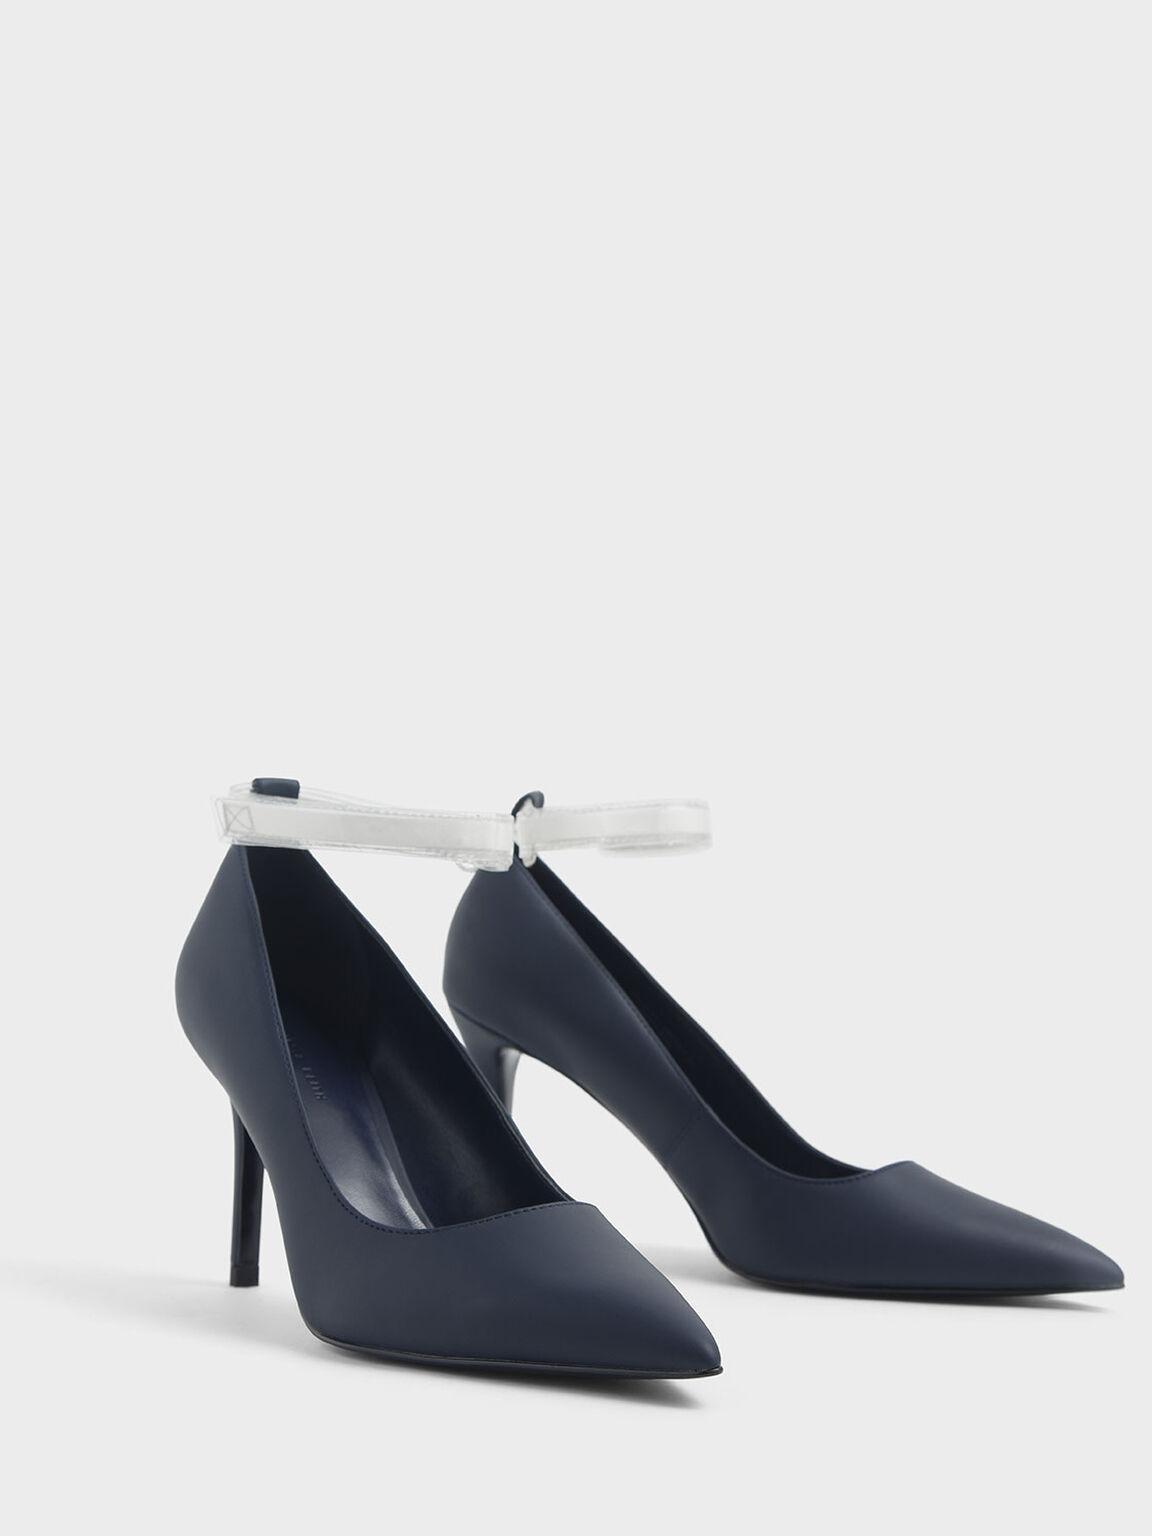 Clear Ankle Strap Stiletto Pumps, Dark Blue, hi-res